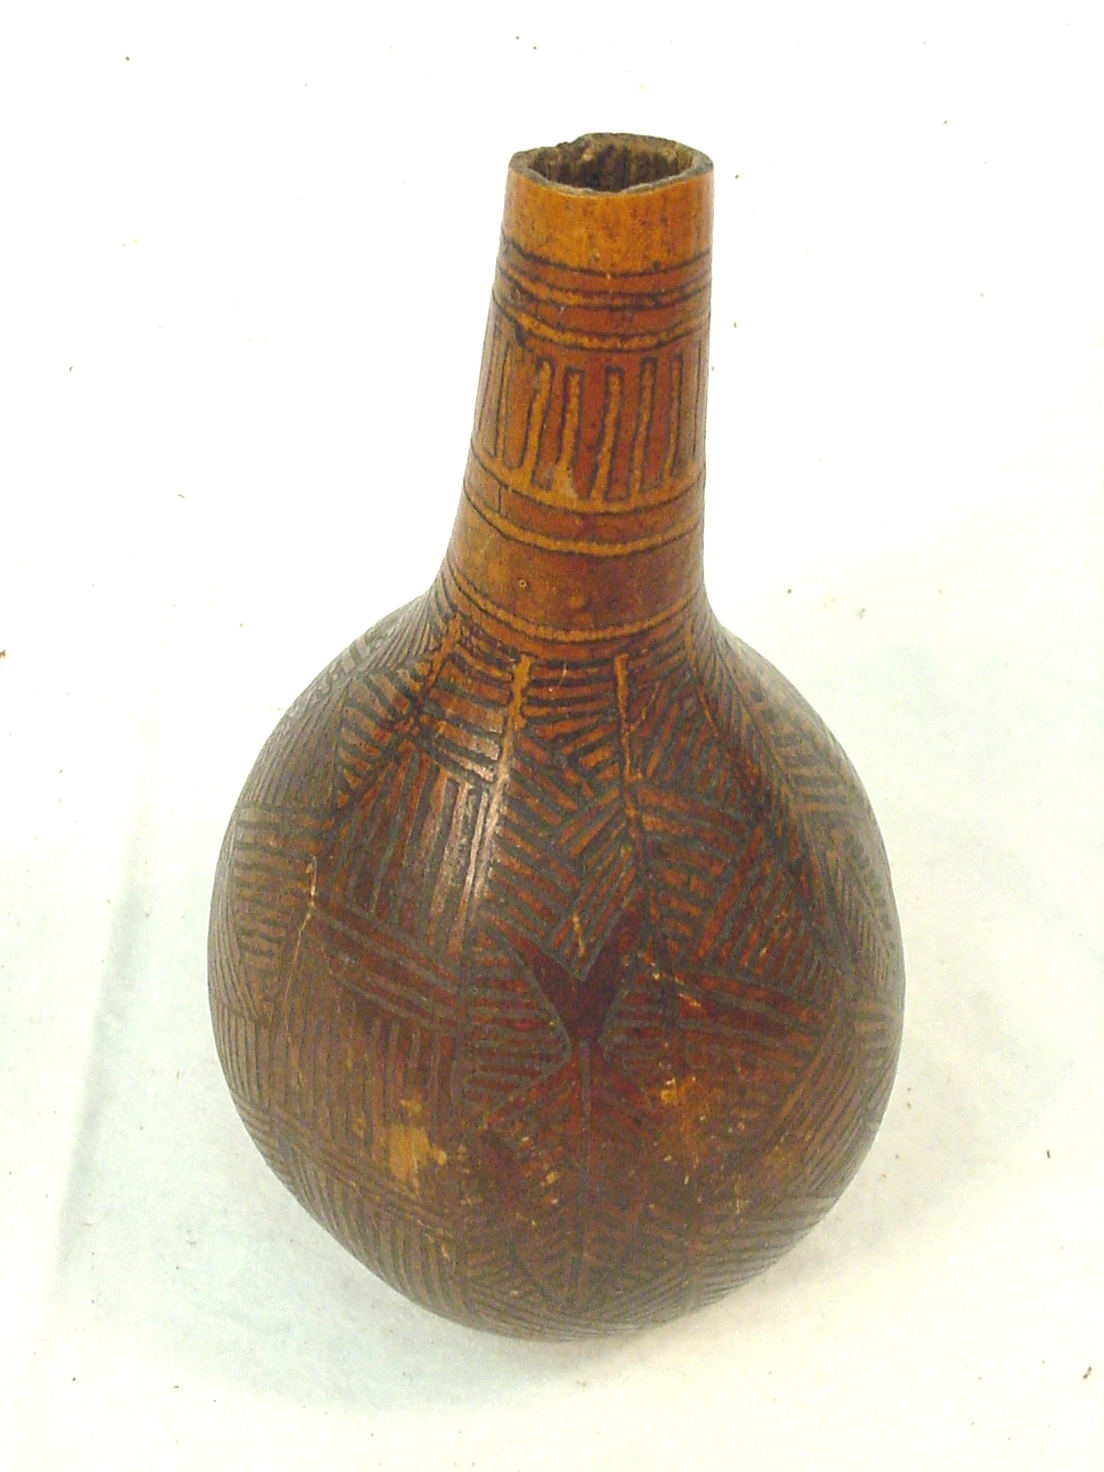 Water gourd